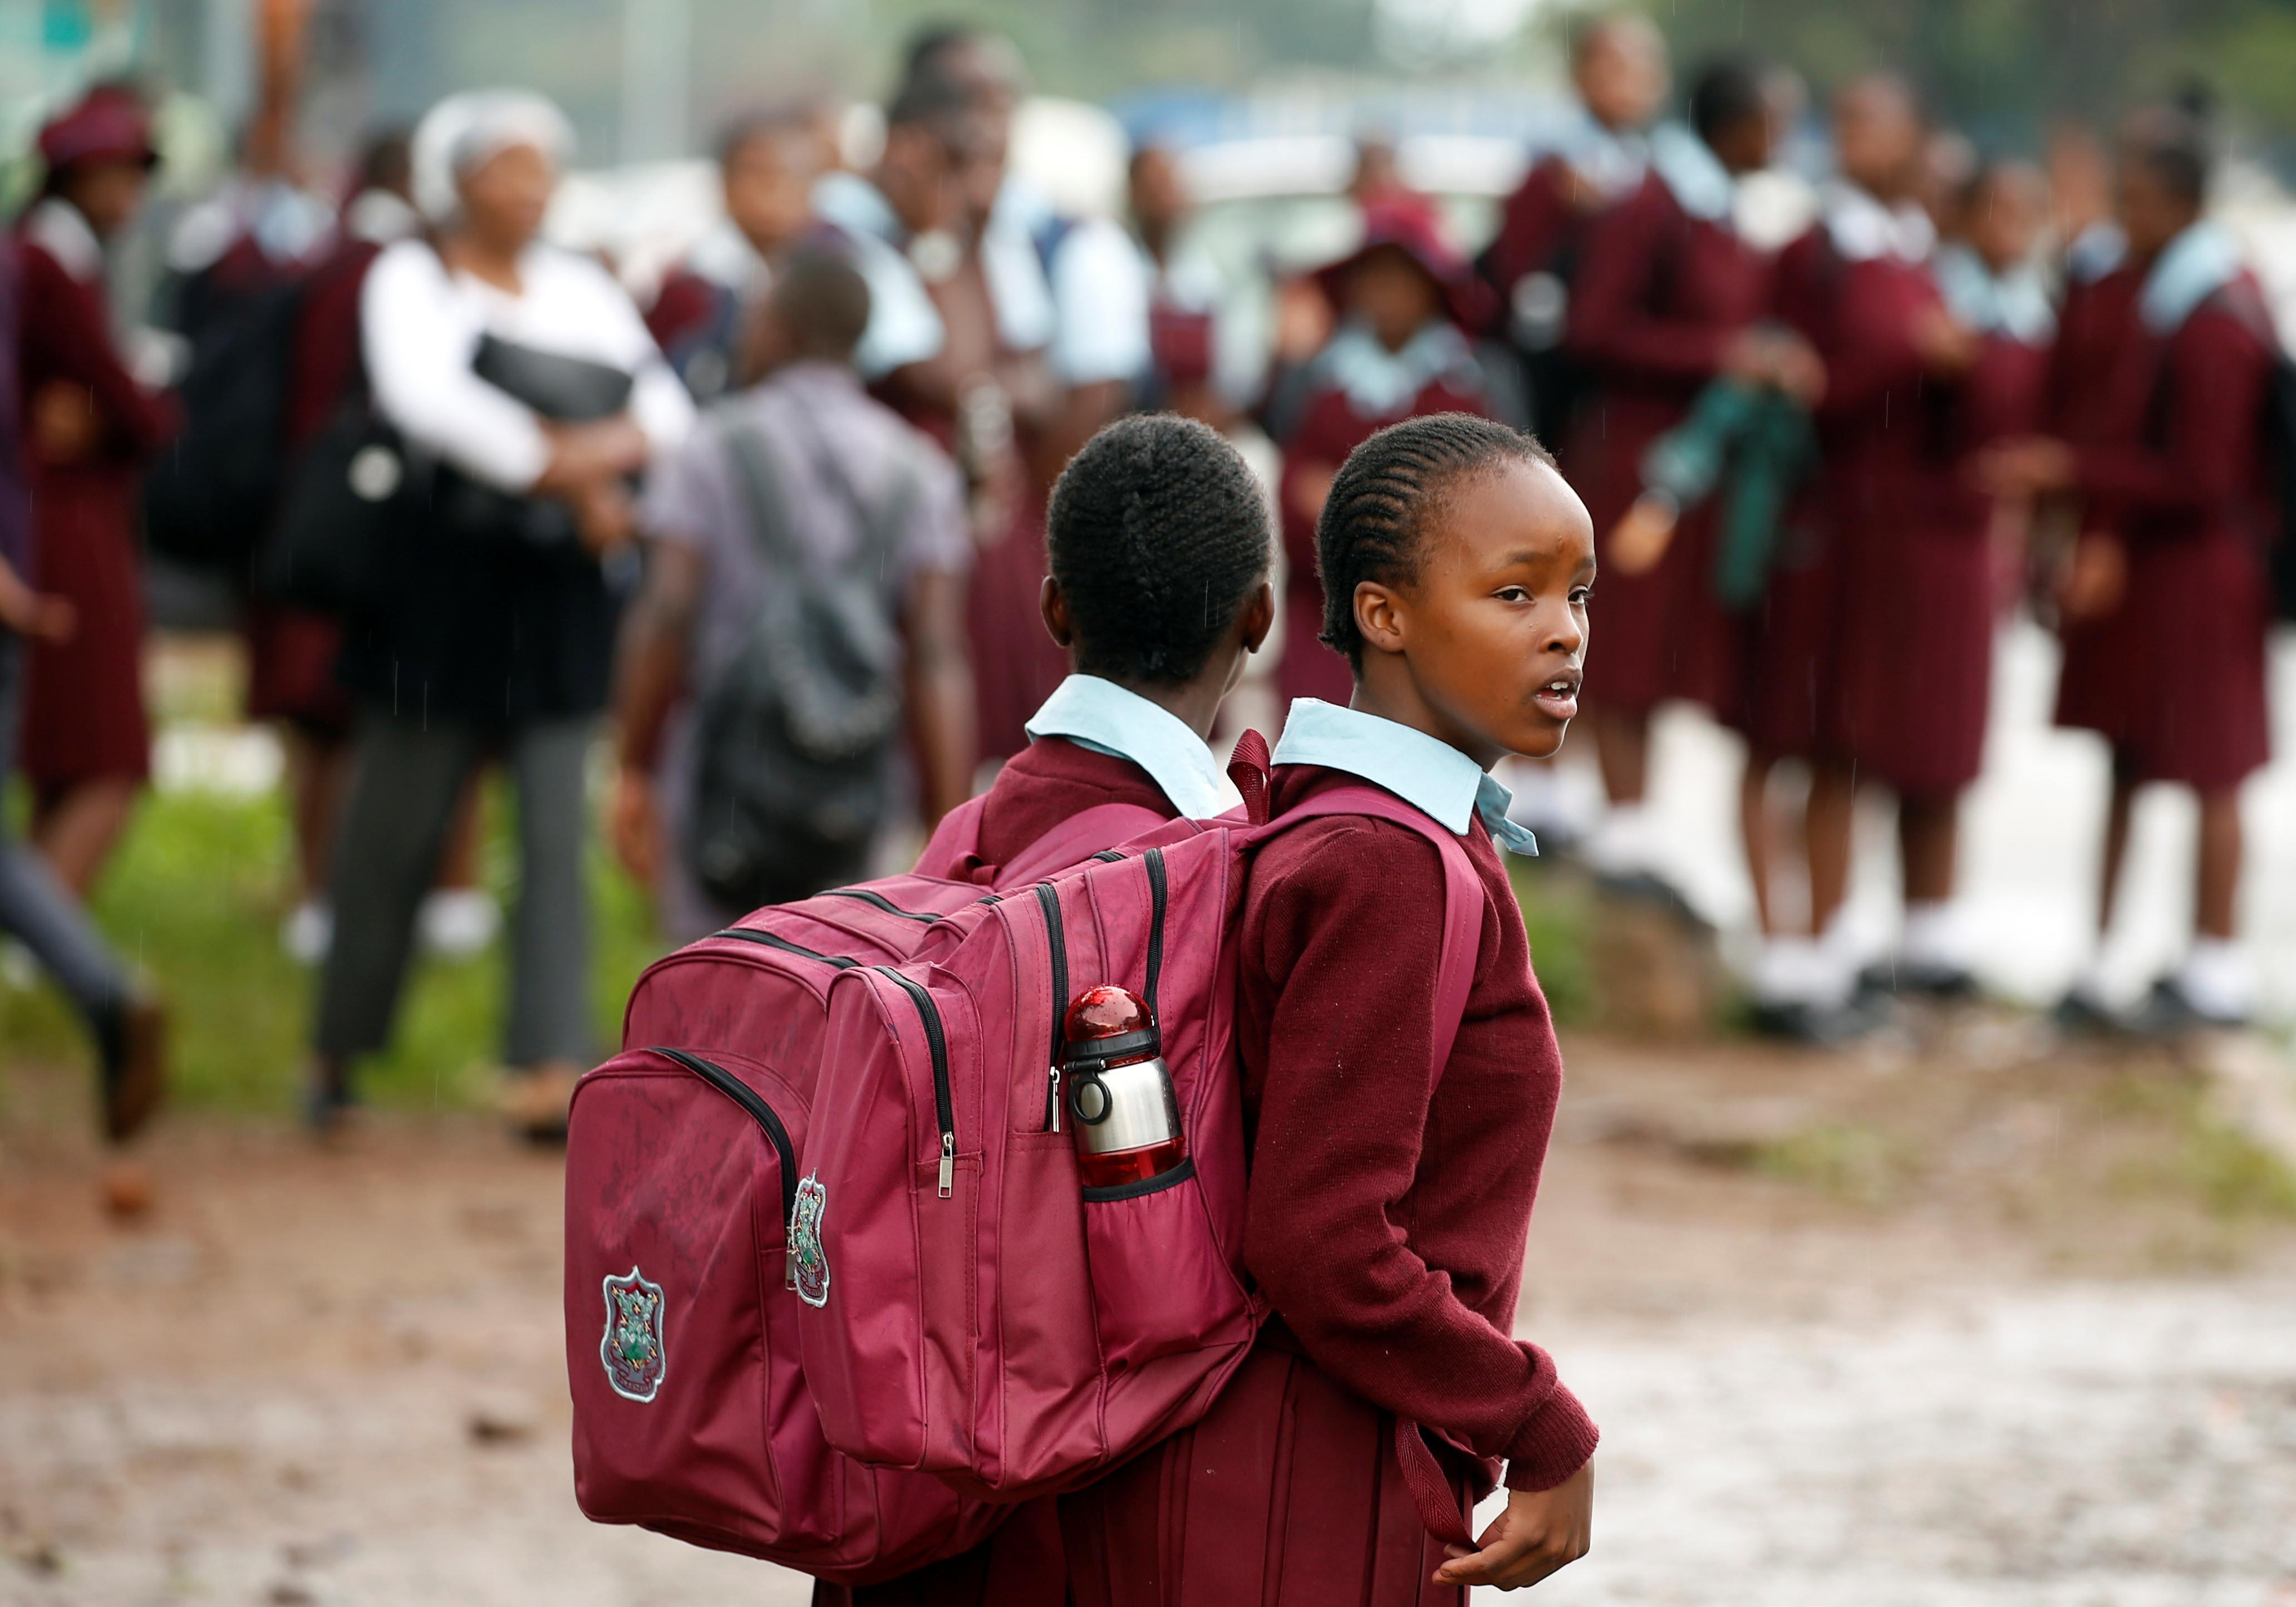 Zimbabwean school children walk home from school in Harare, Zimbabwe, January 10, 2019. REUTERS/Philimon Bulawayo - RC1D67B5BB00